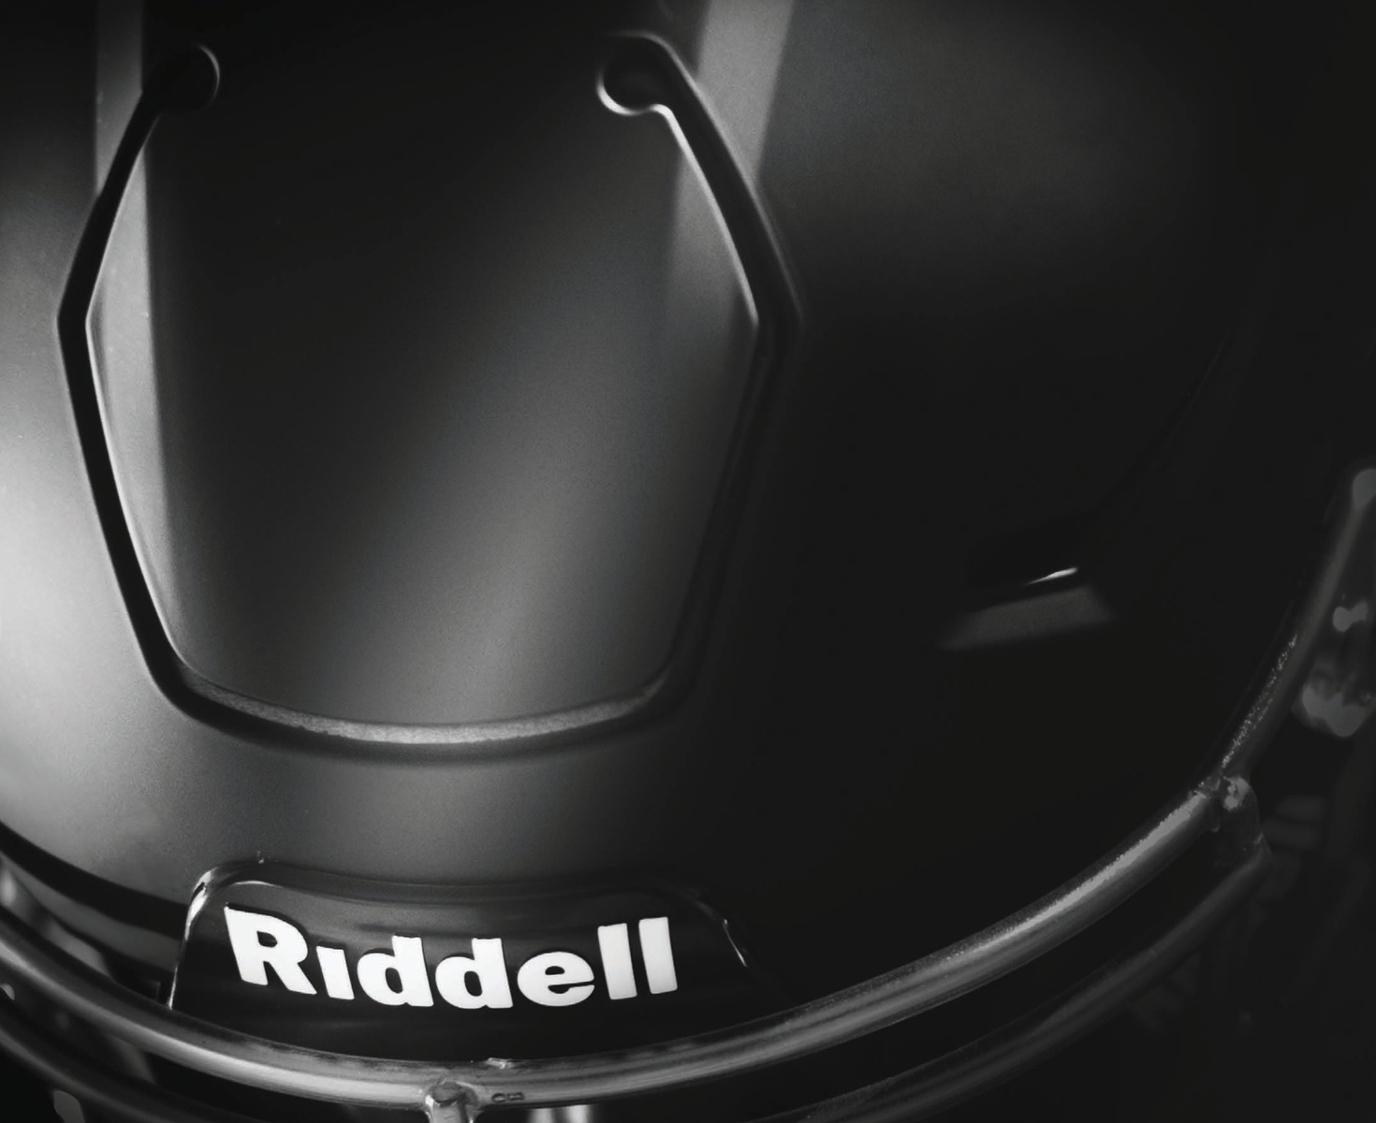 Riddell 2018 Key Account Catalog 49d8fef99